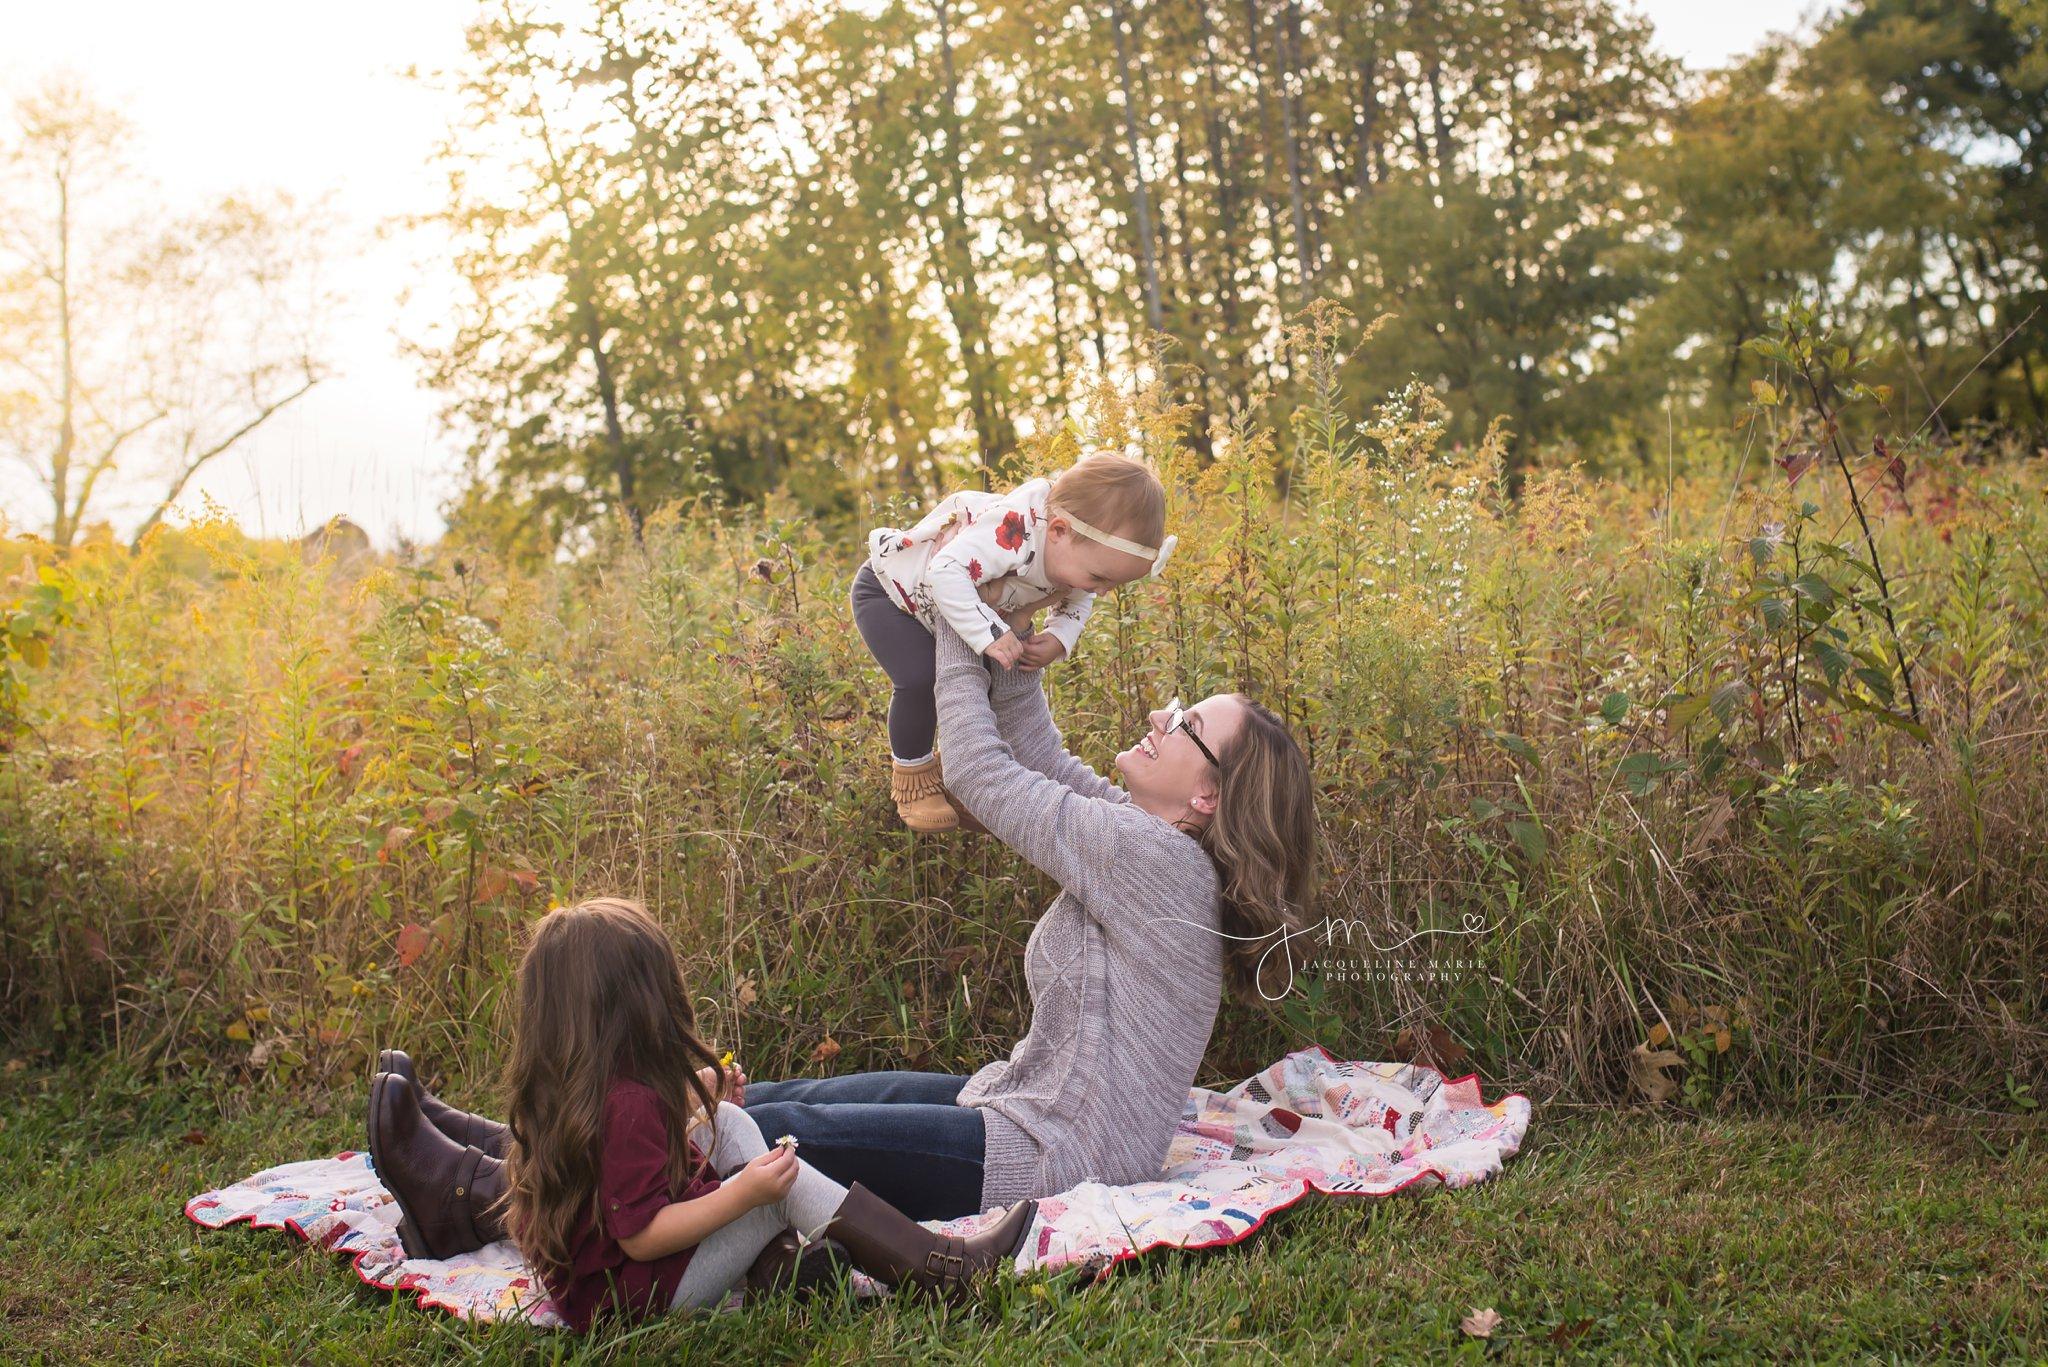 Columbus Ohio family photographer, Columbus Ohio children photographer, fall family photography, mother and daughter